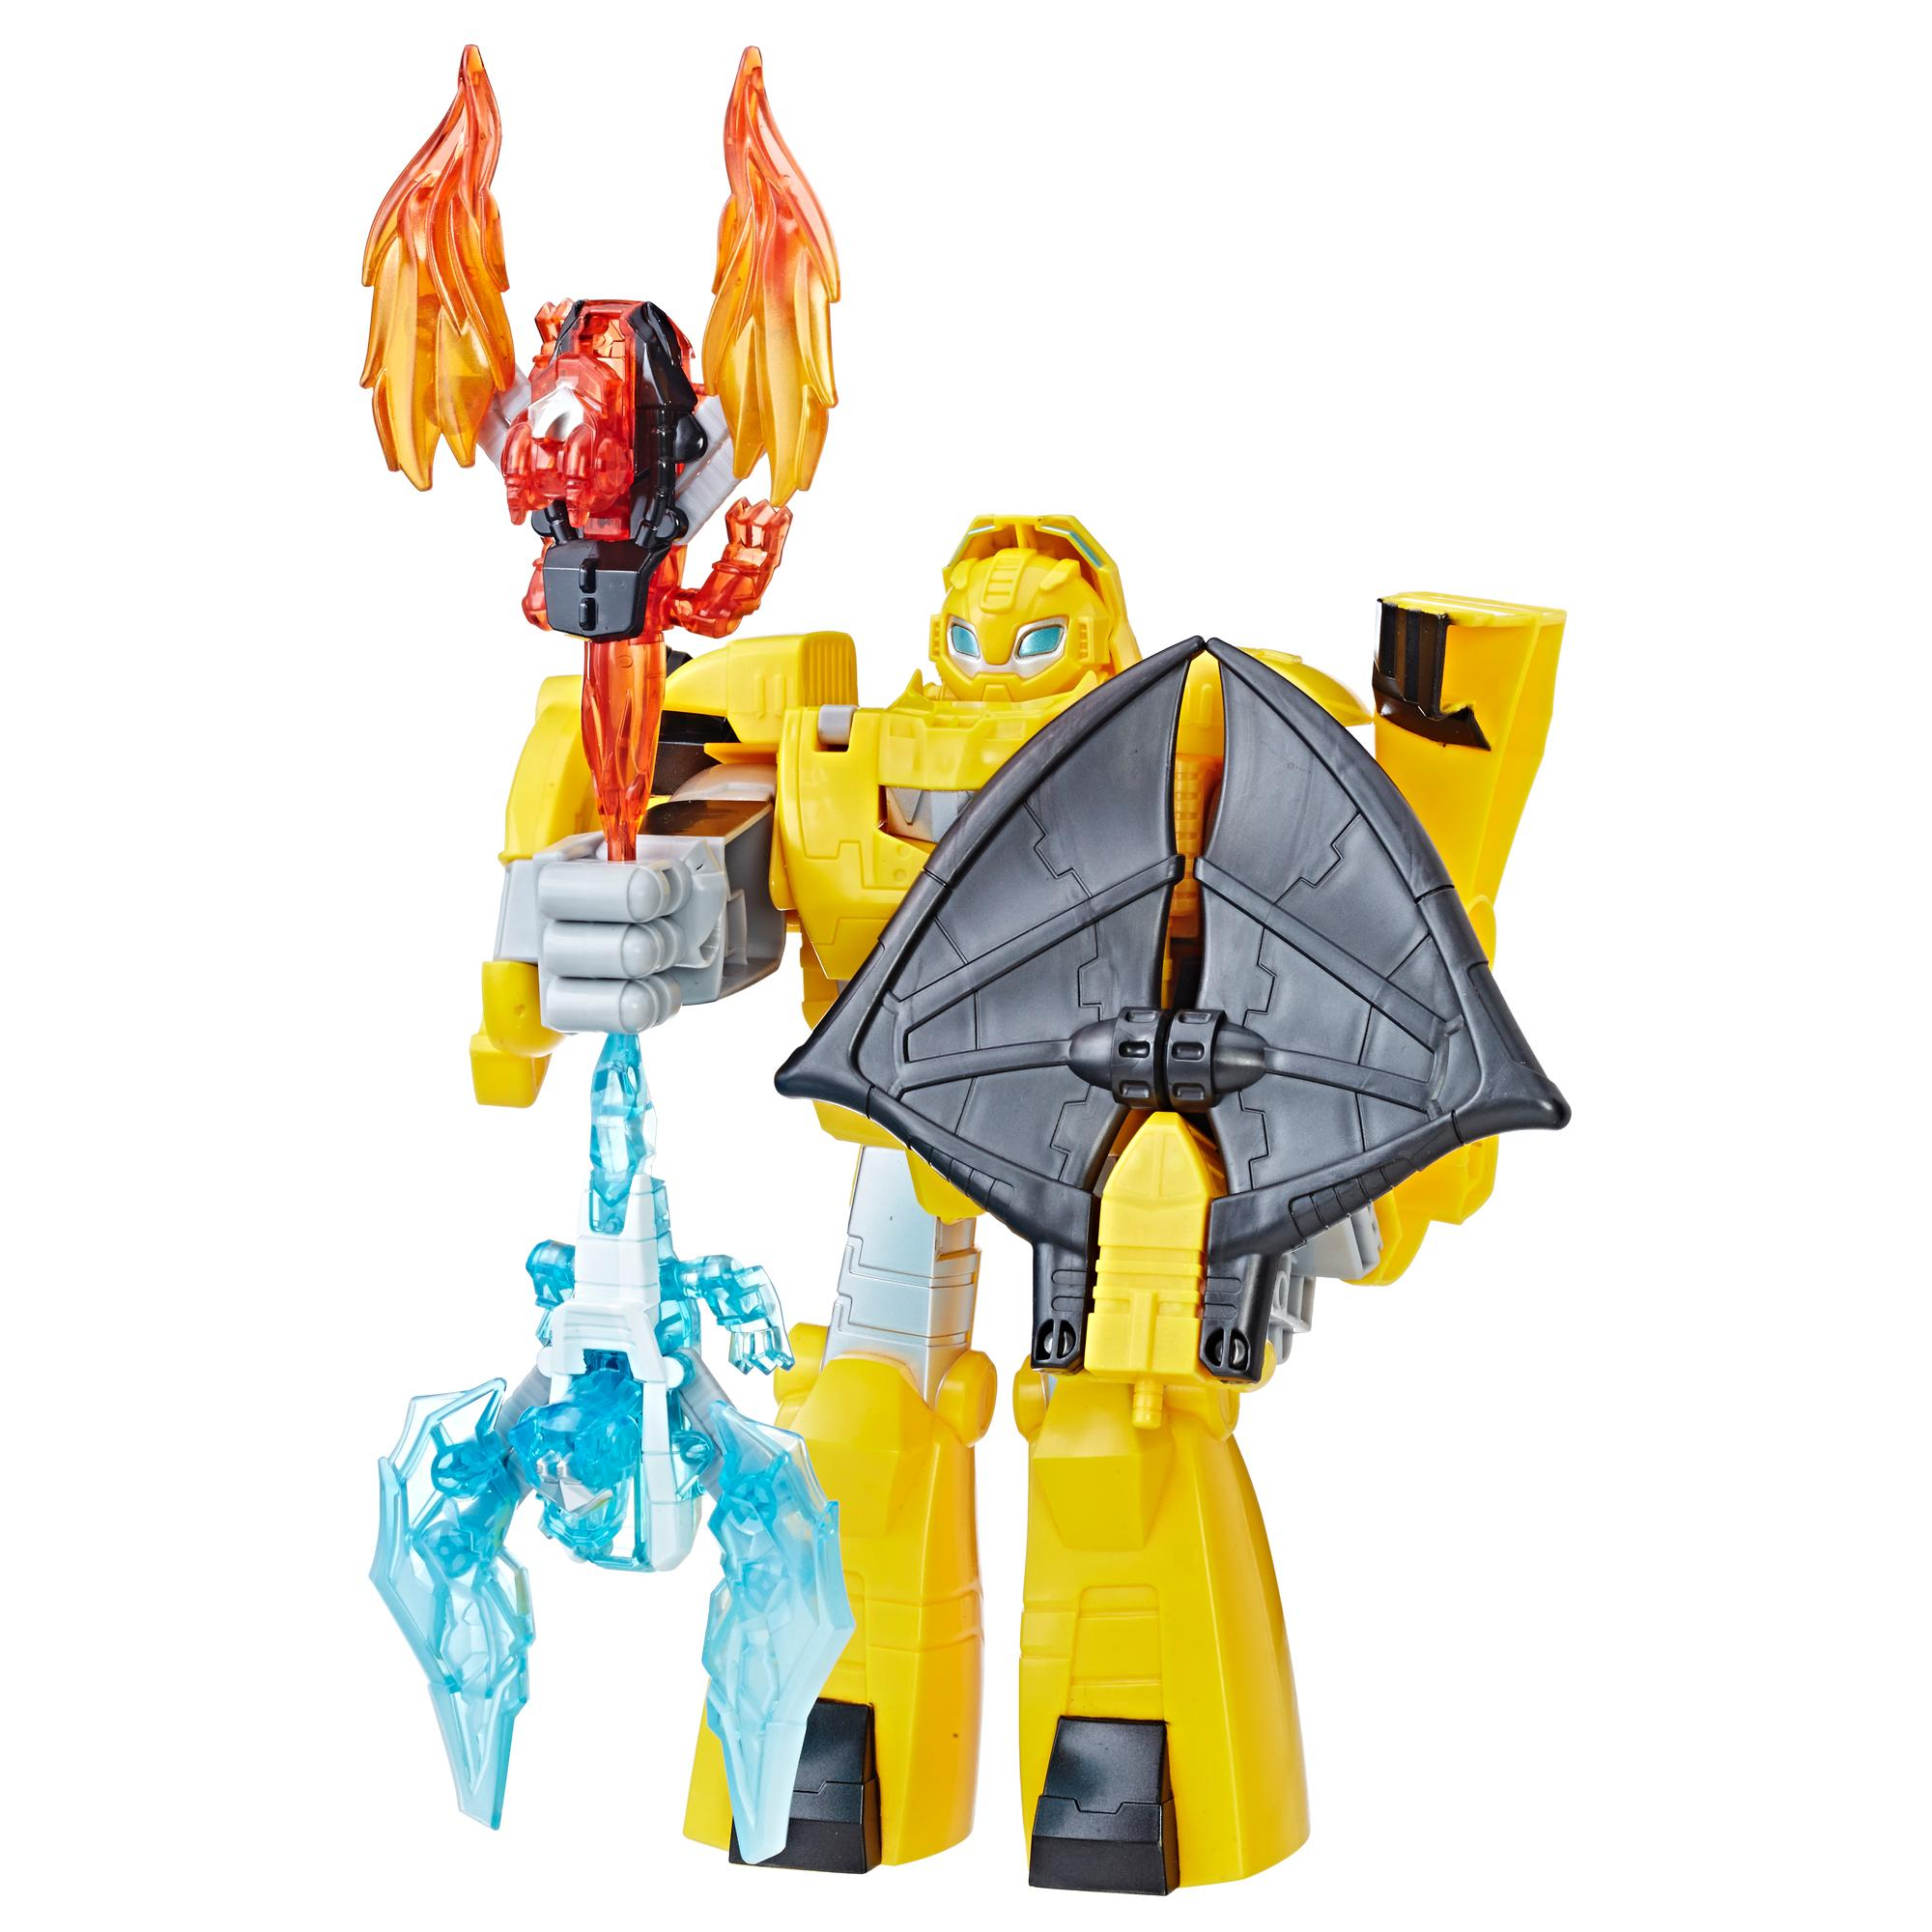 Playskool Heroes Transformers Rescue Bots - Bumblebee Cavaleiro Vigilante